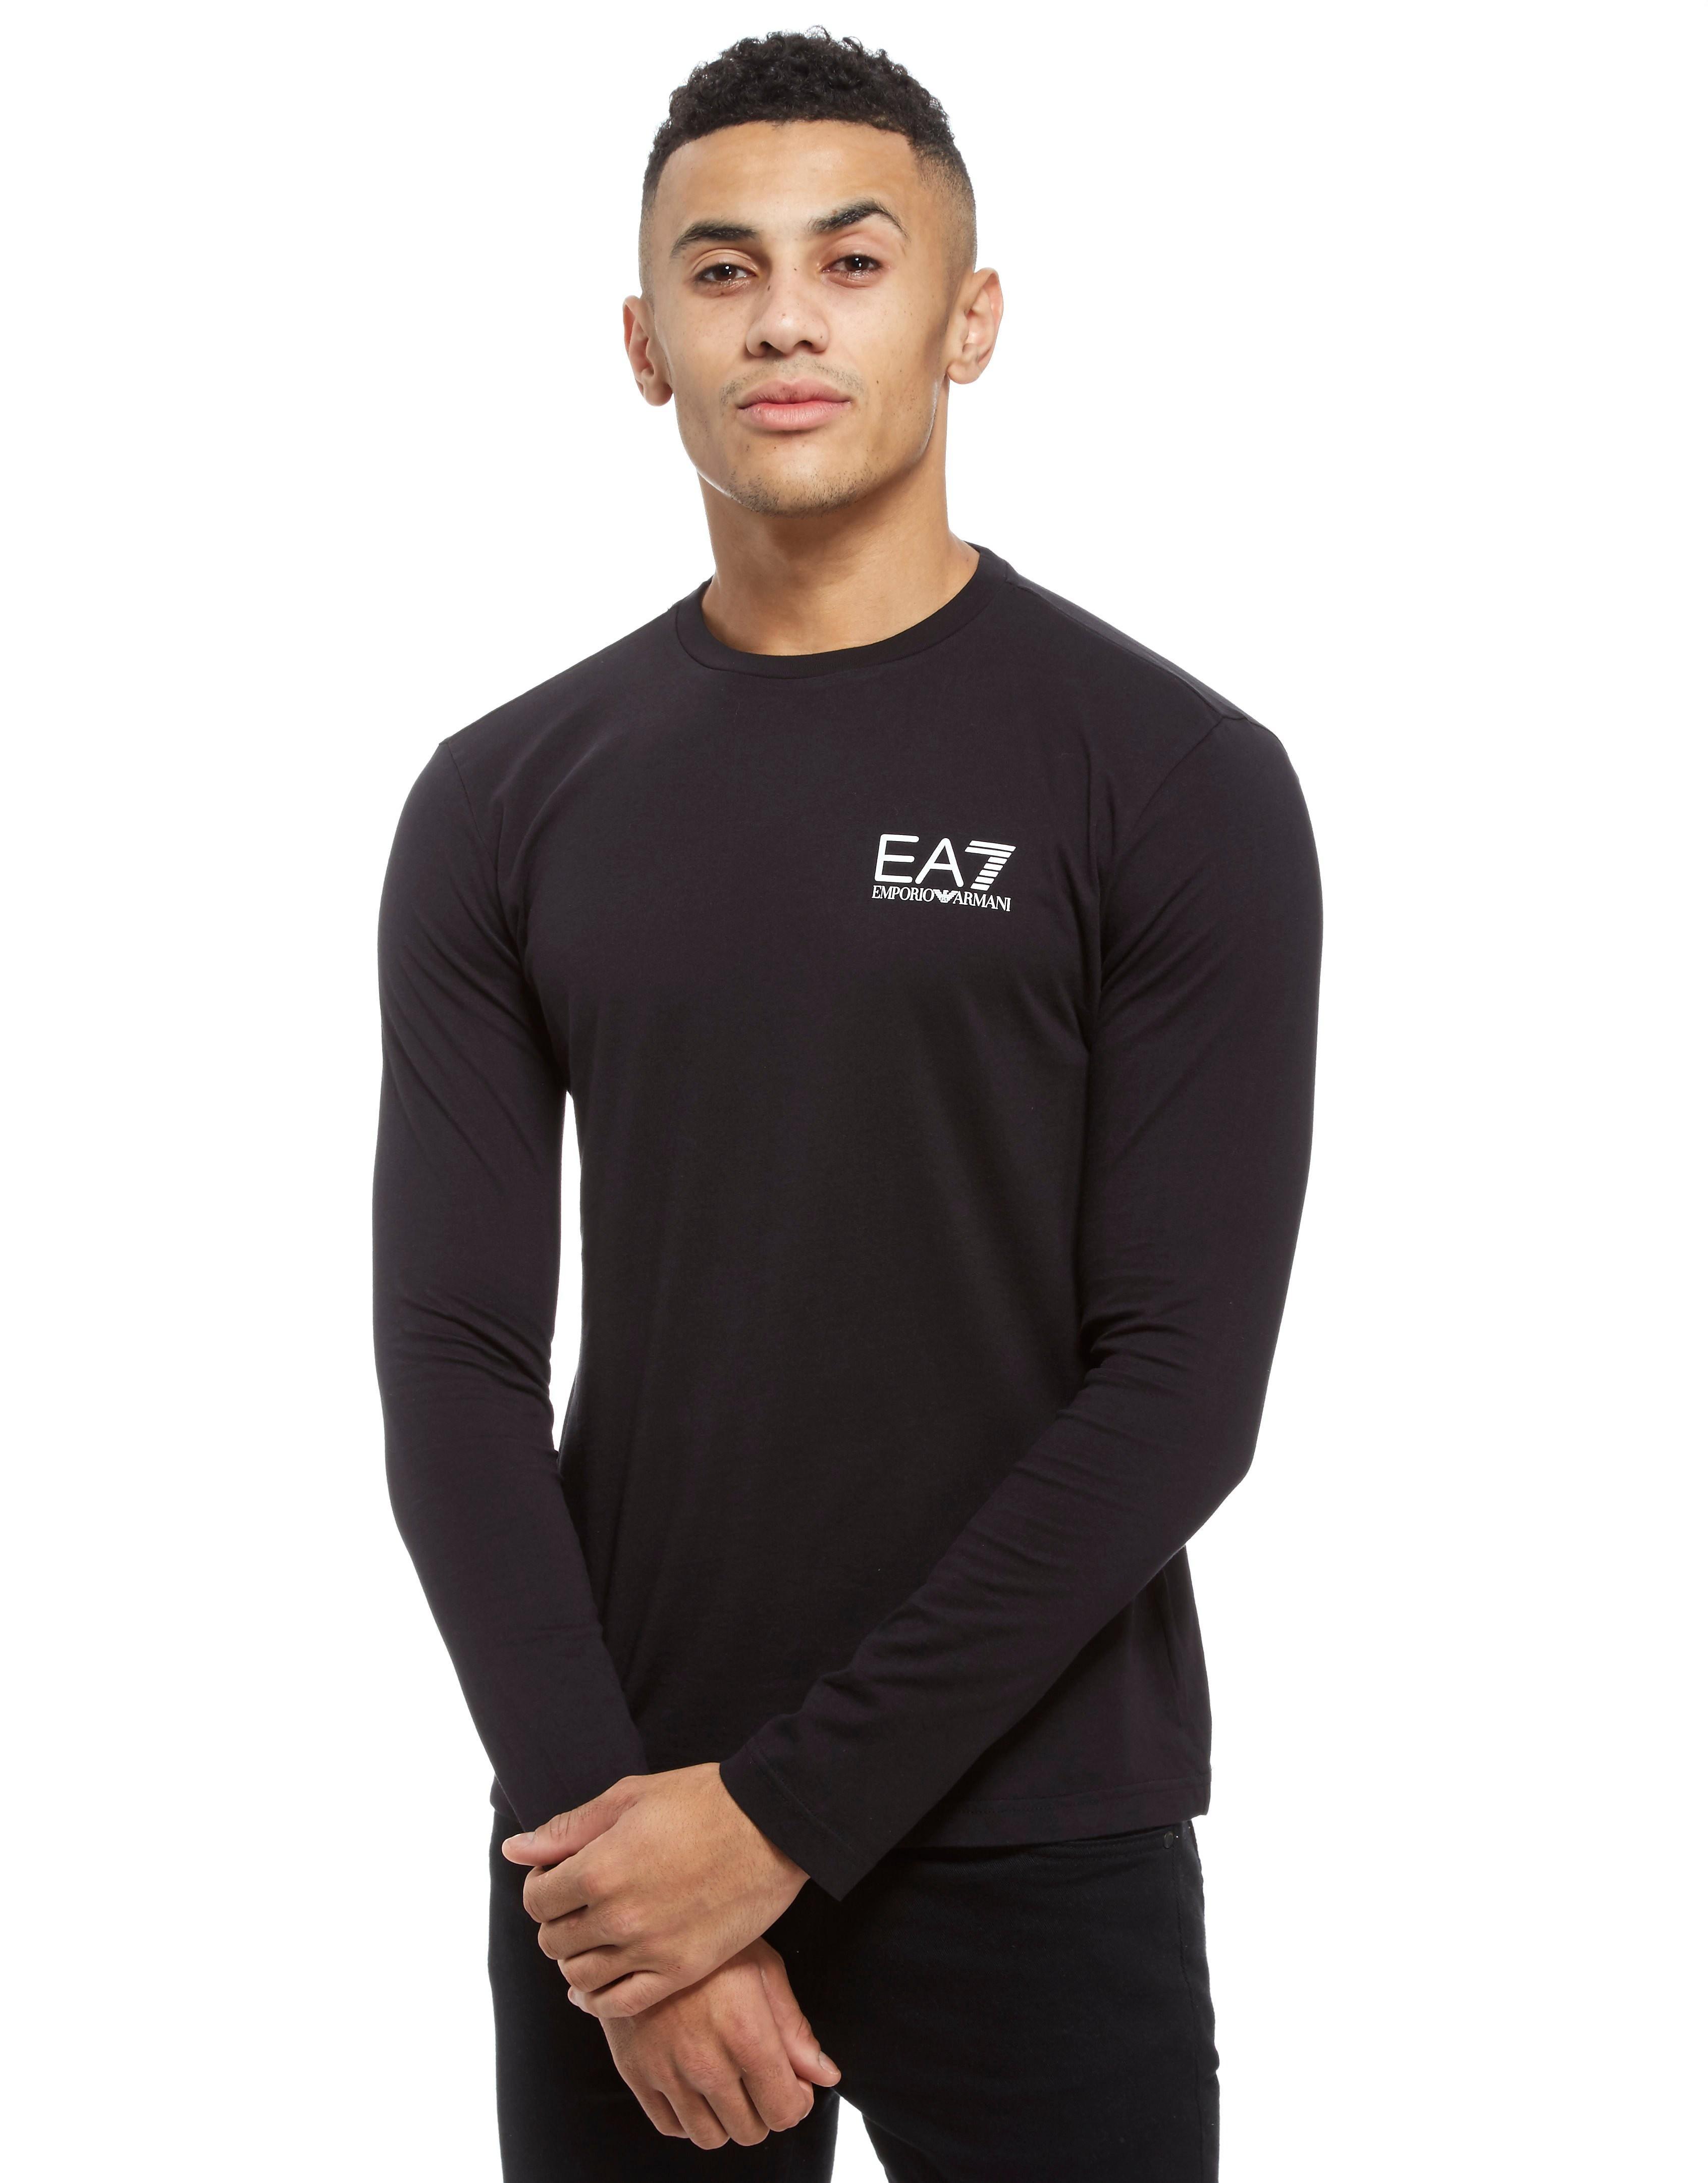 Emporio Armani EA7 Core T-shirt Manica Lunga